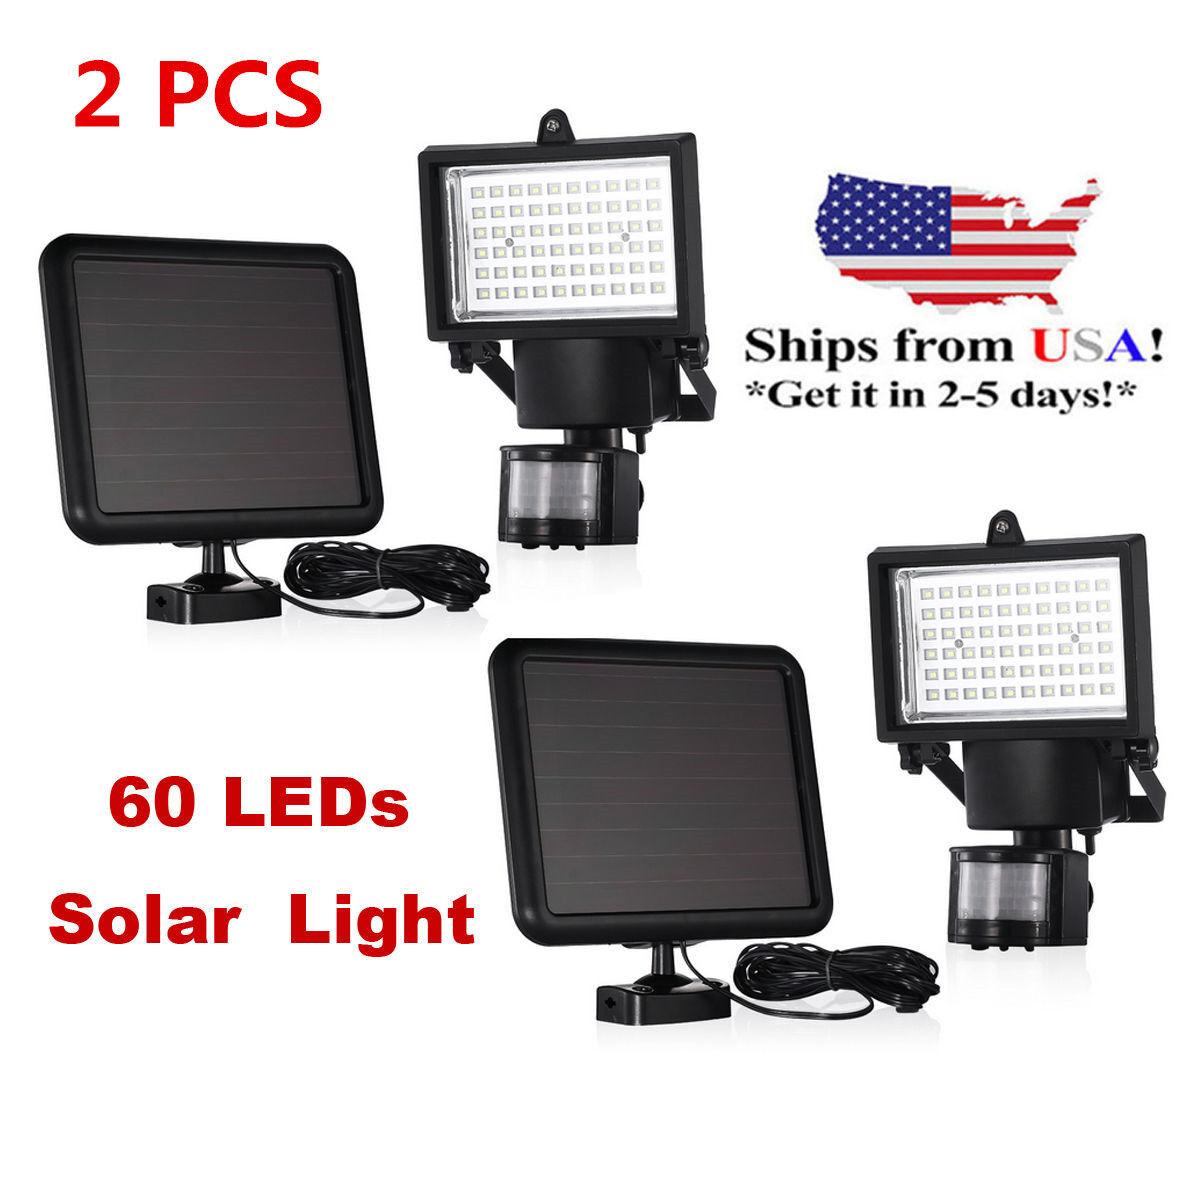 2PACK 60 LEDs Outdoor Garden Solar Motion Sensor Security Flood Light Spot Lamp9